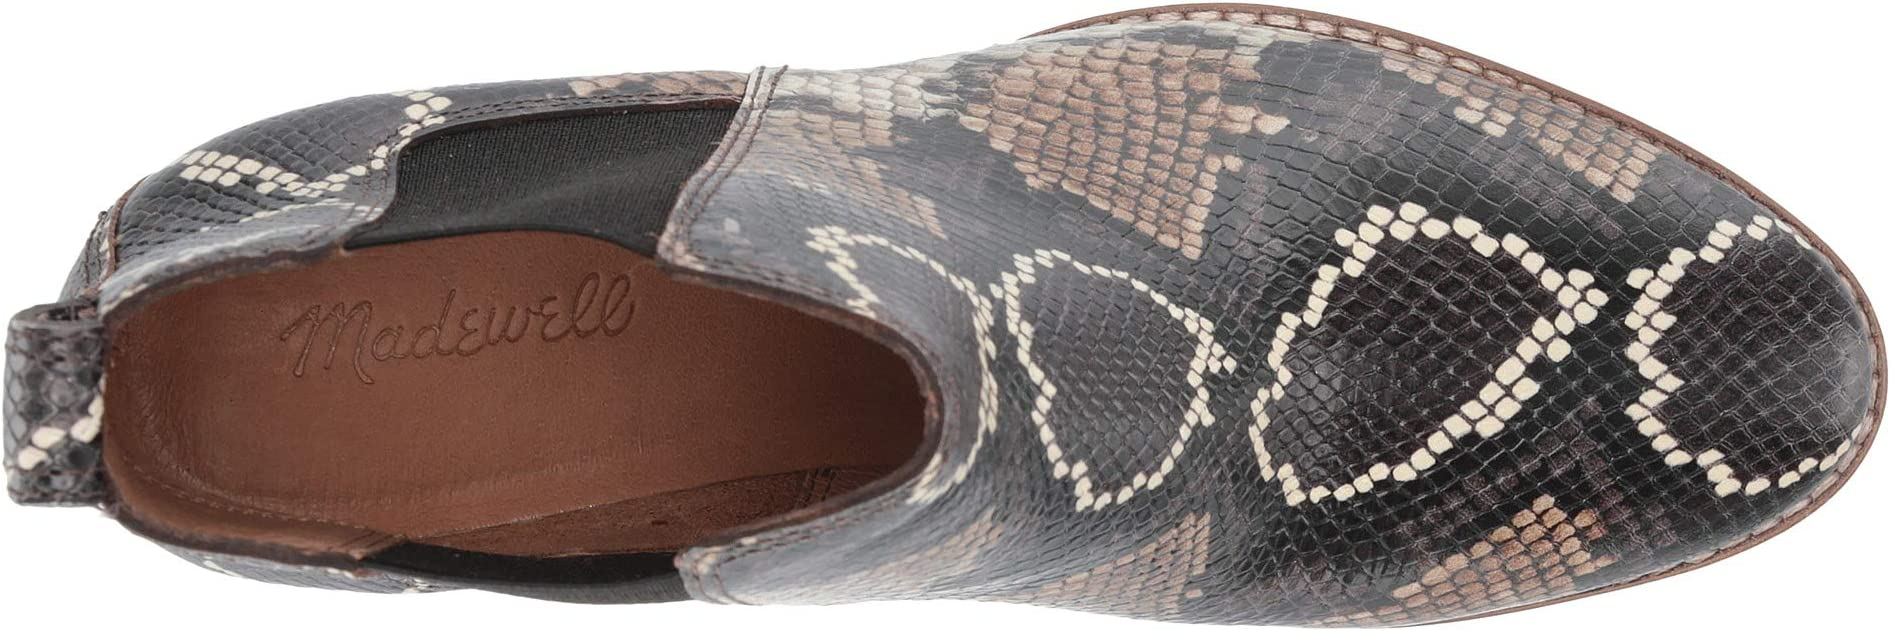 Madewell Regan Boot | Women's shoes | 2020 Newest